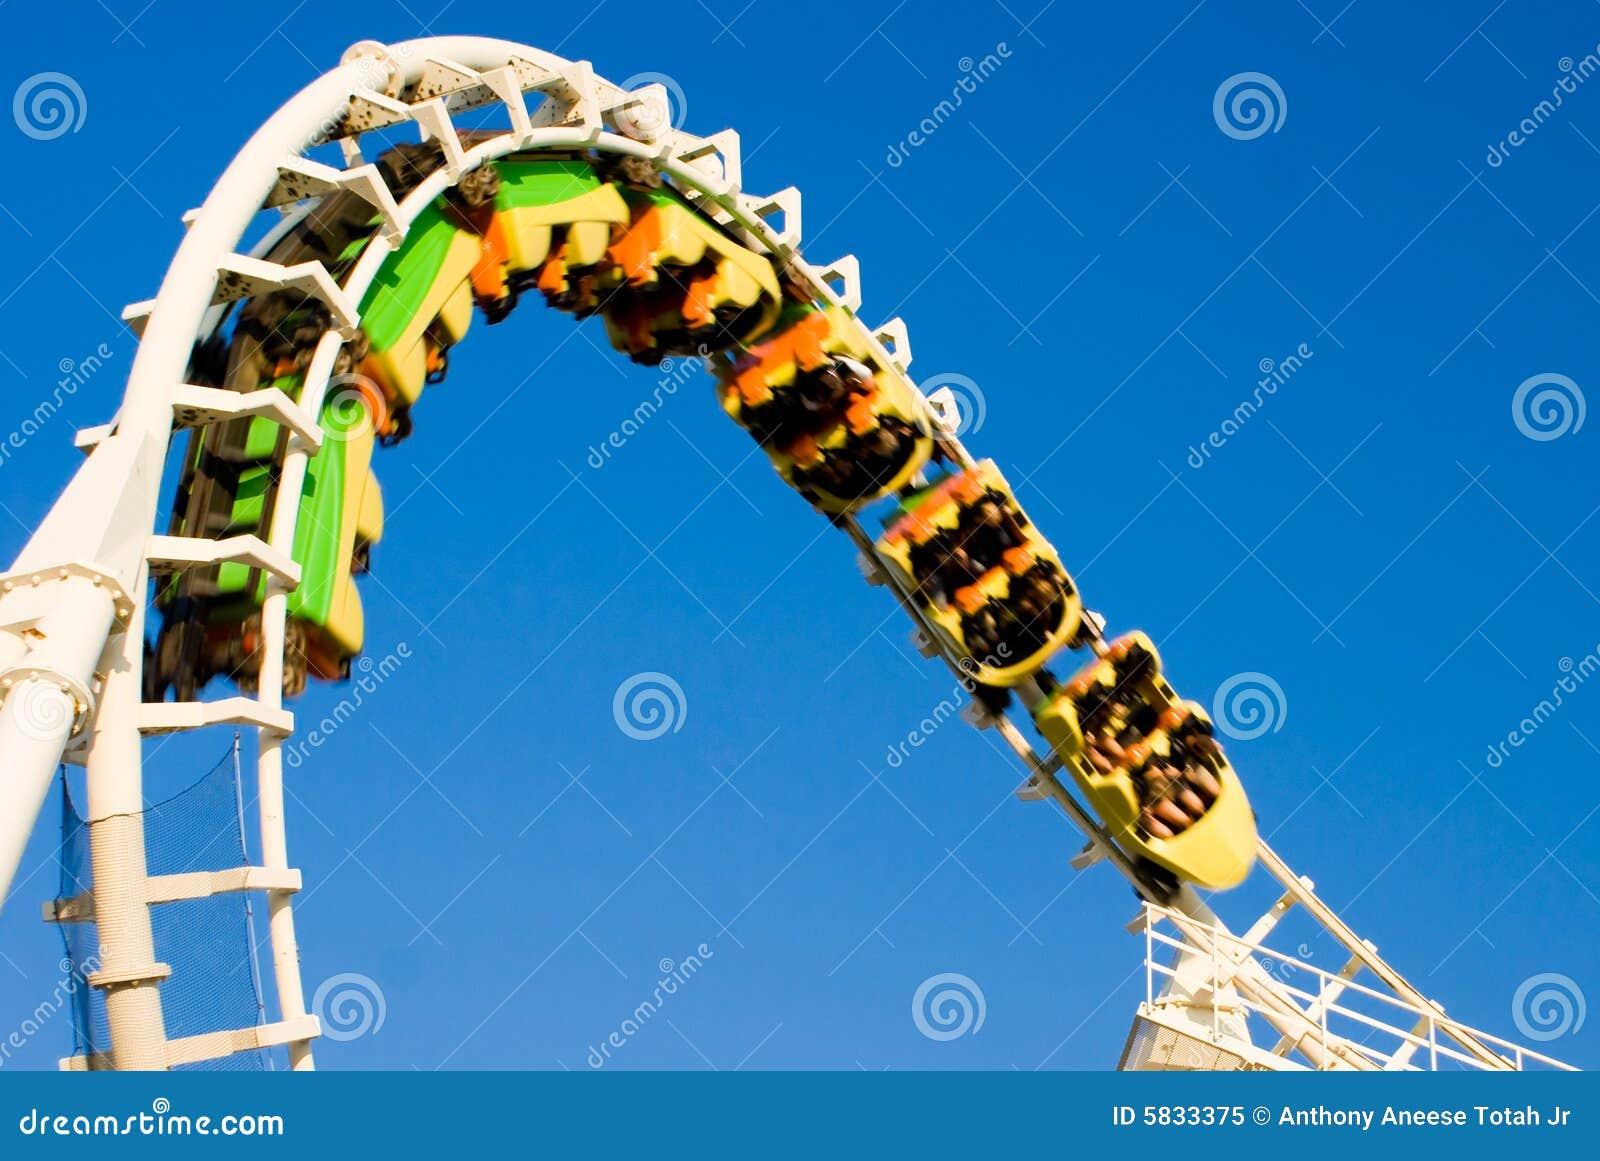 Inverterad rollercoaster